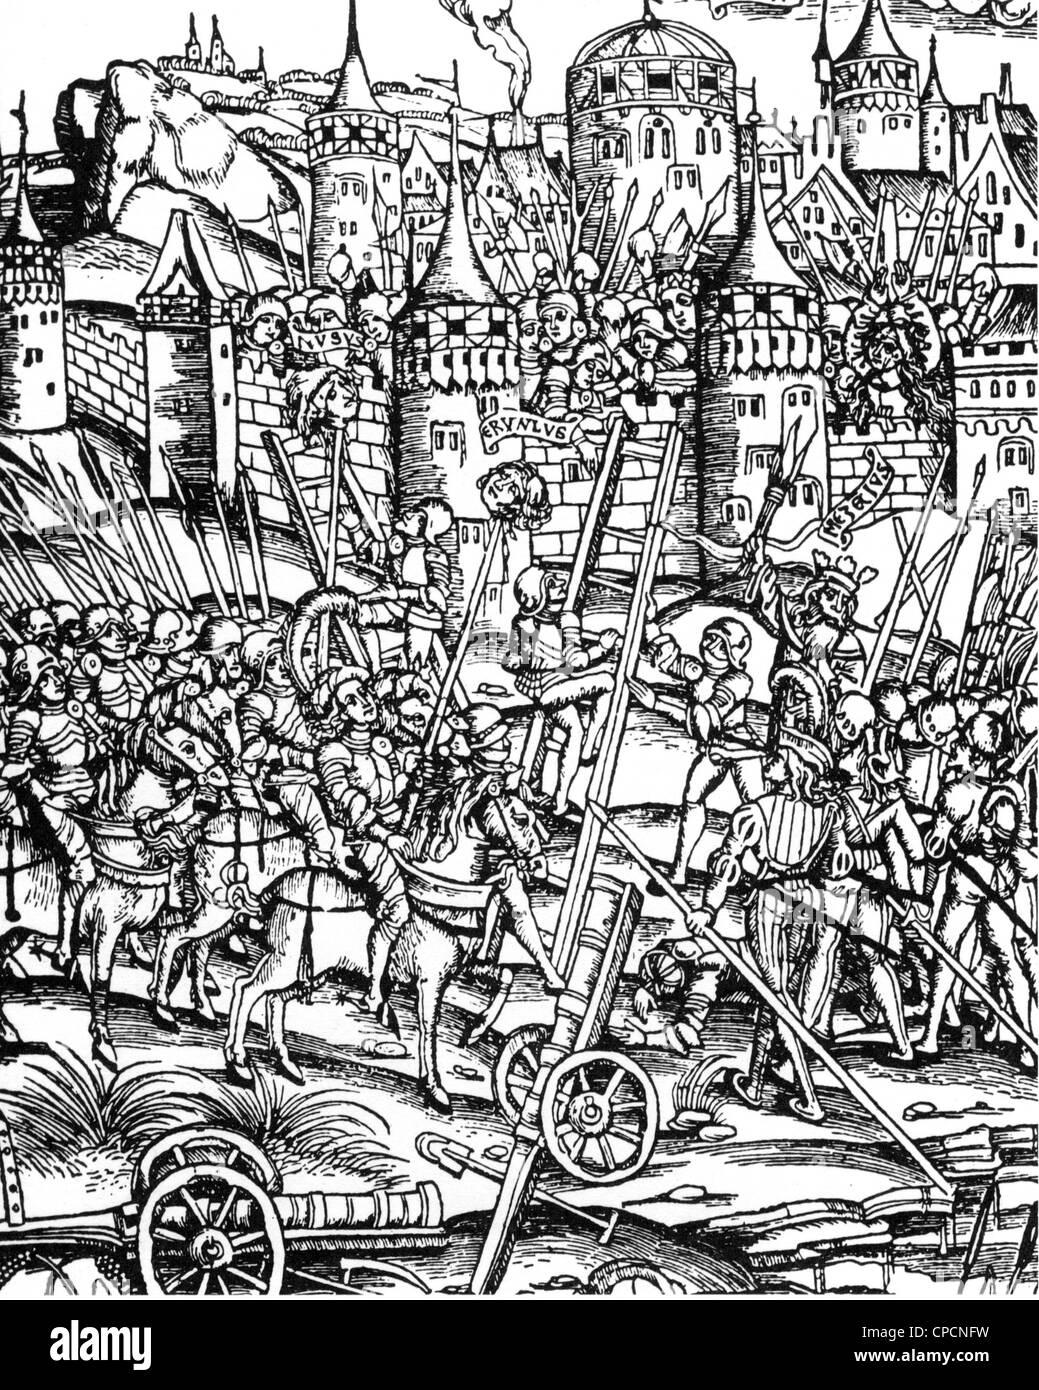 Assedio medioevali WARFARE Immagini Stock